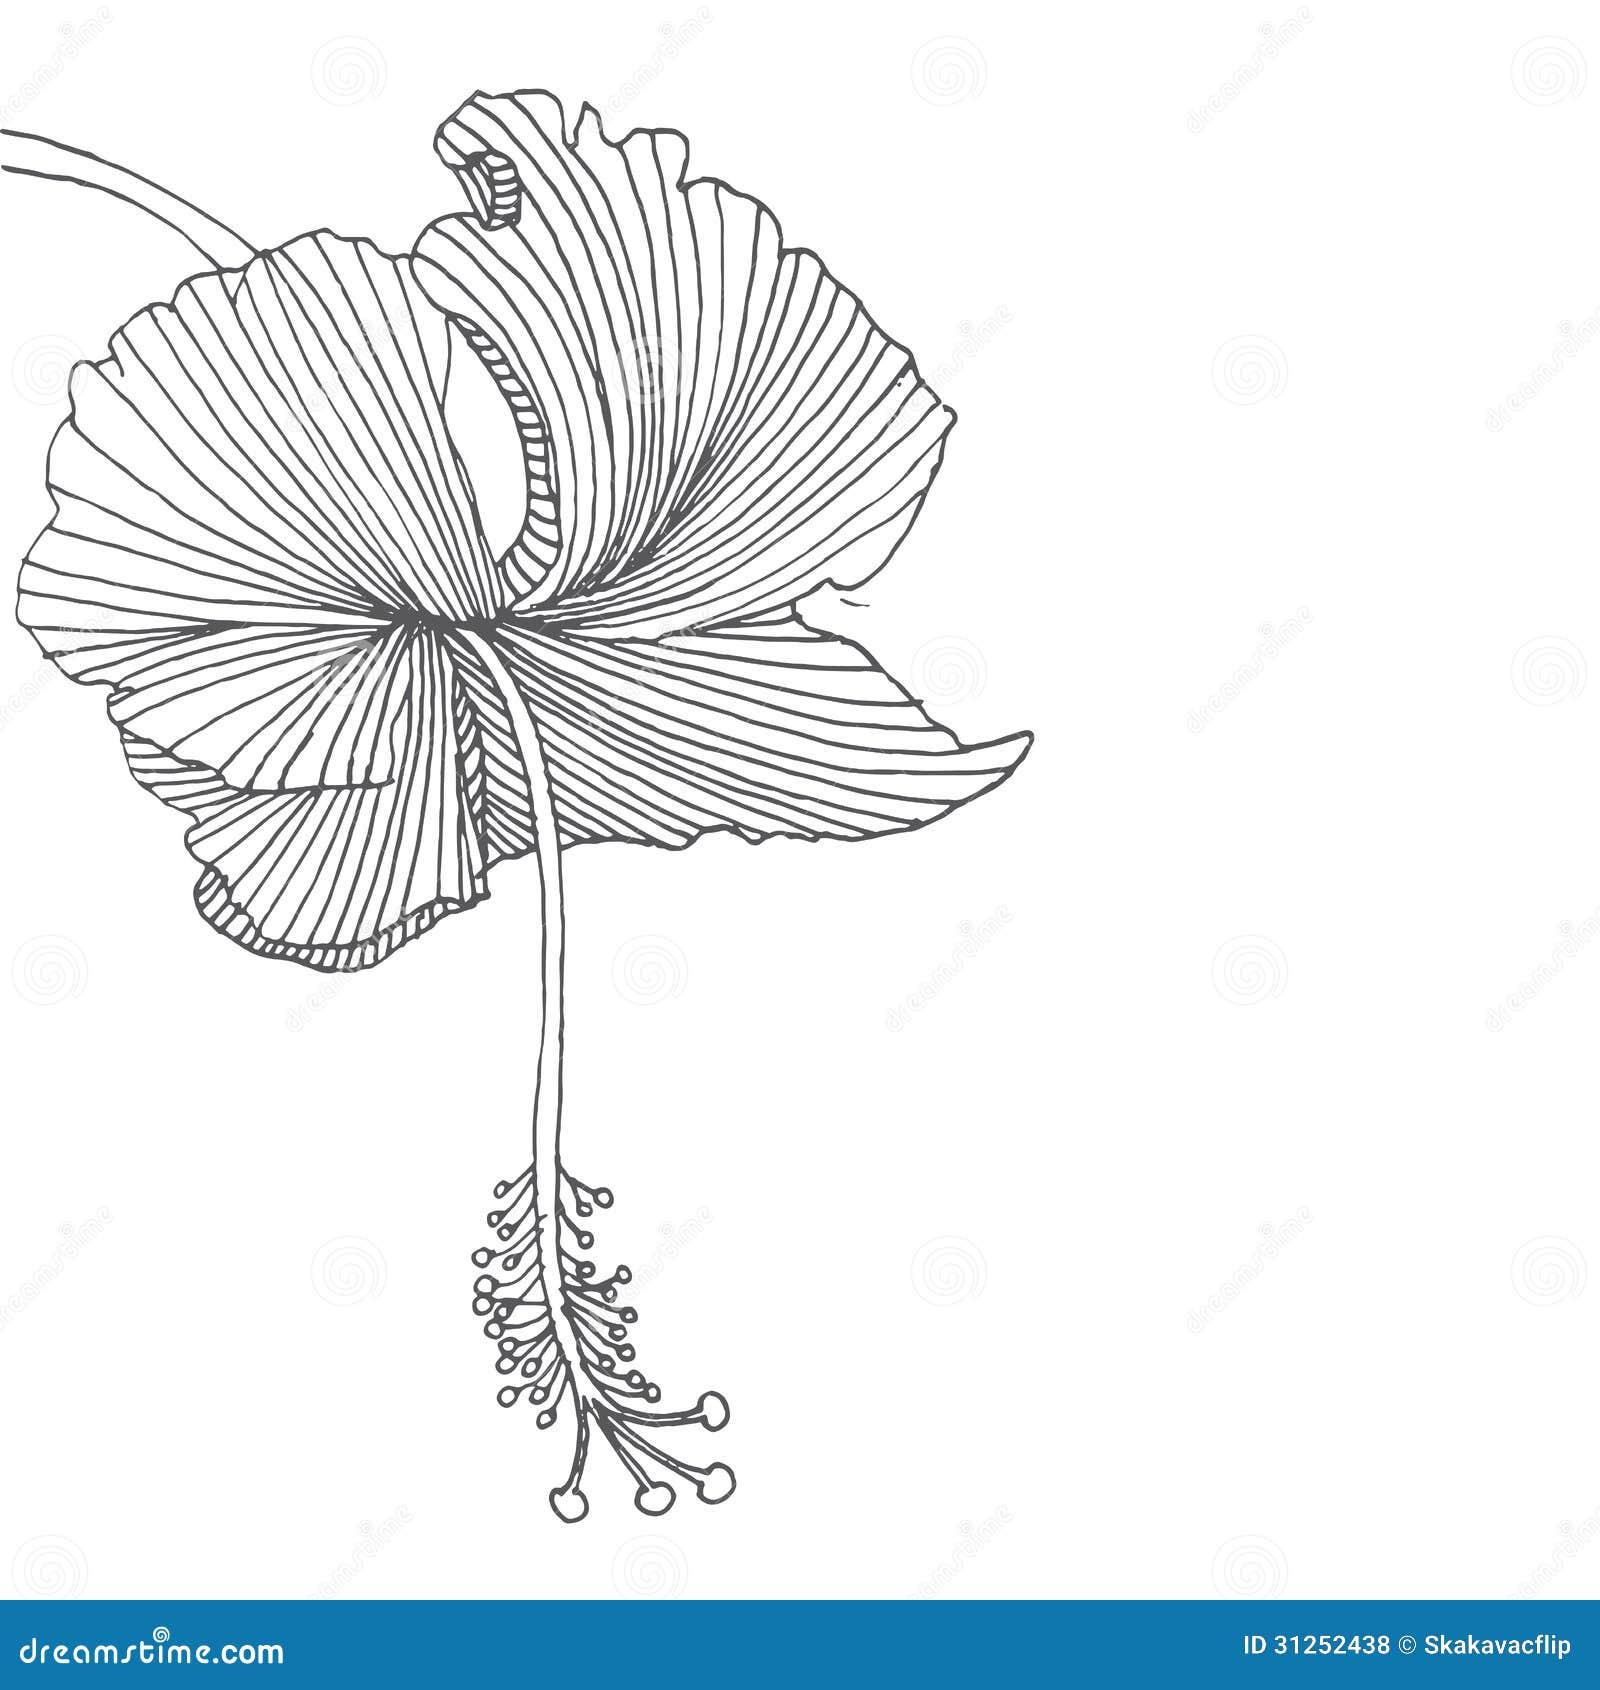 Hibiscus Flower Royalty Free Stock Photos Image 31252438